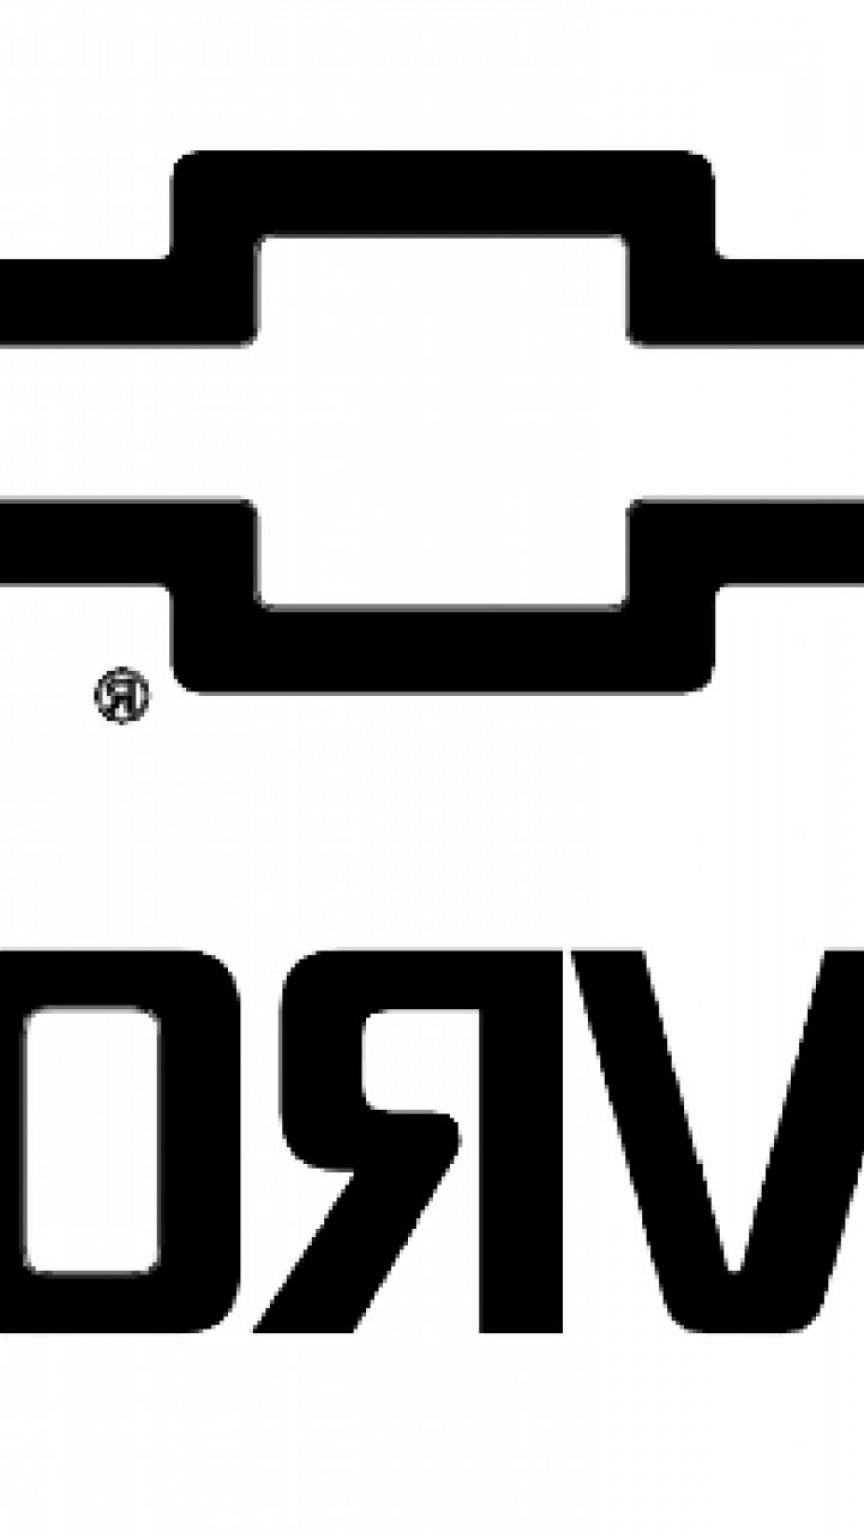 864x1536 Chevrolet Logo Vector Muscle Cars Wallpapers Createmepink